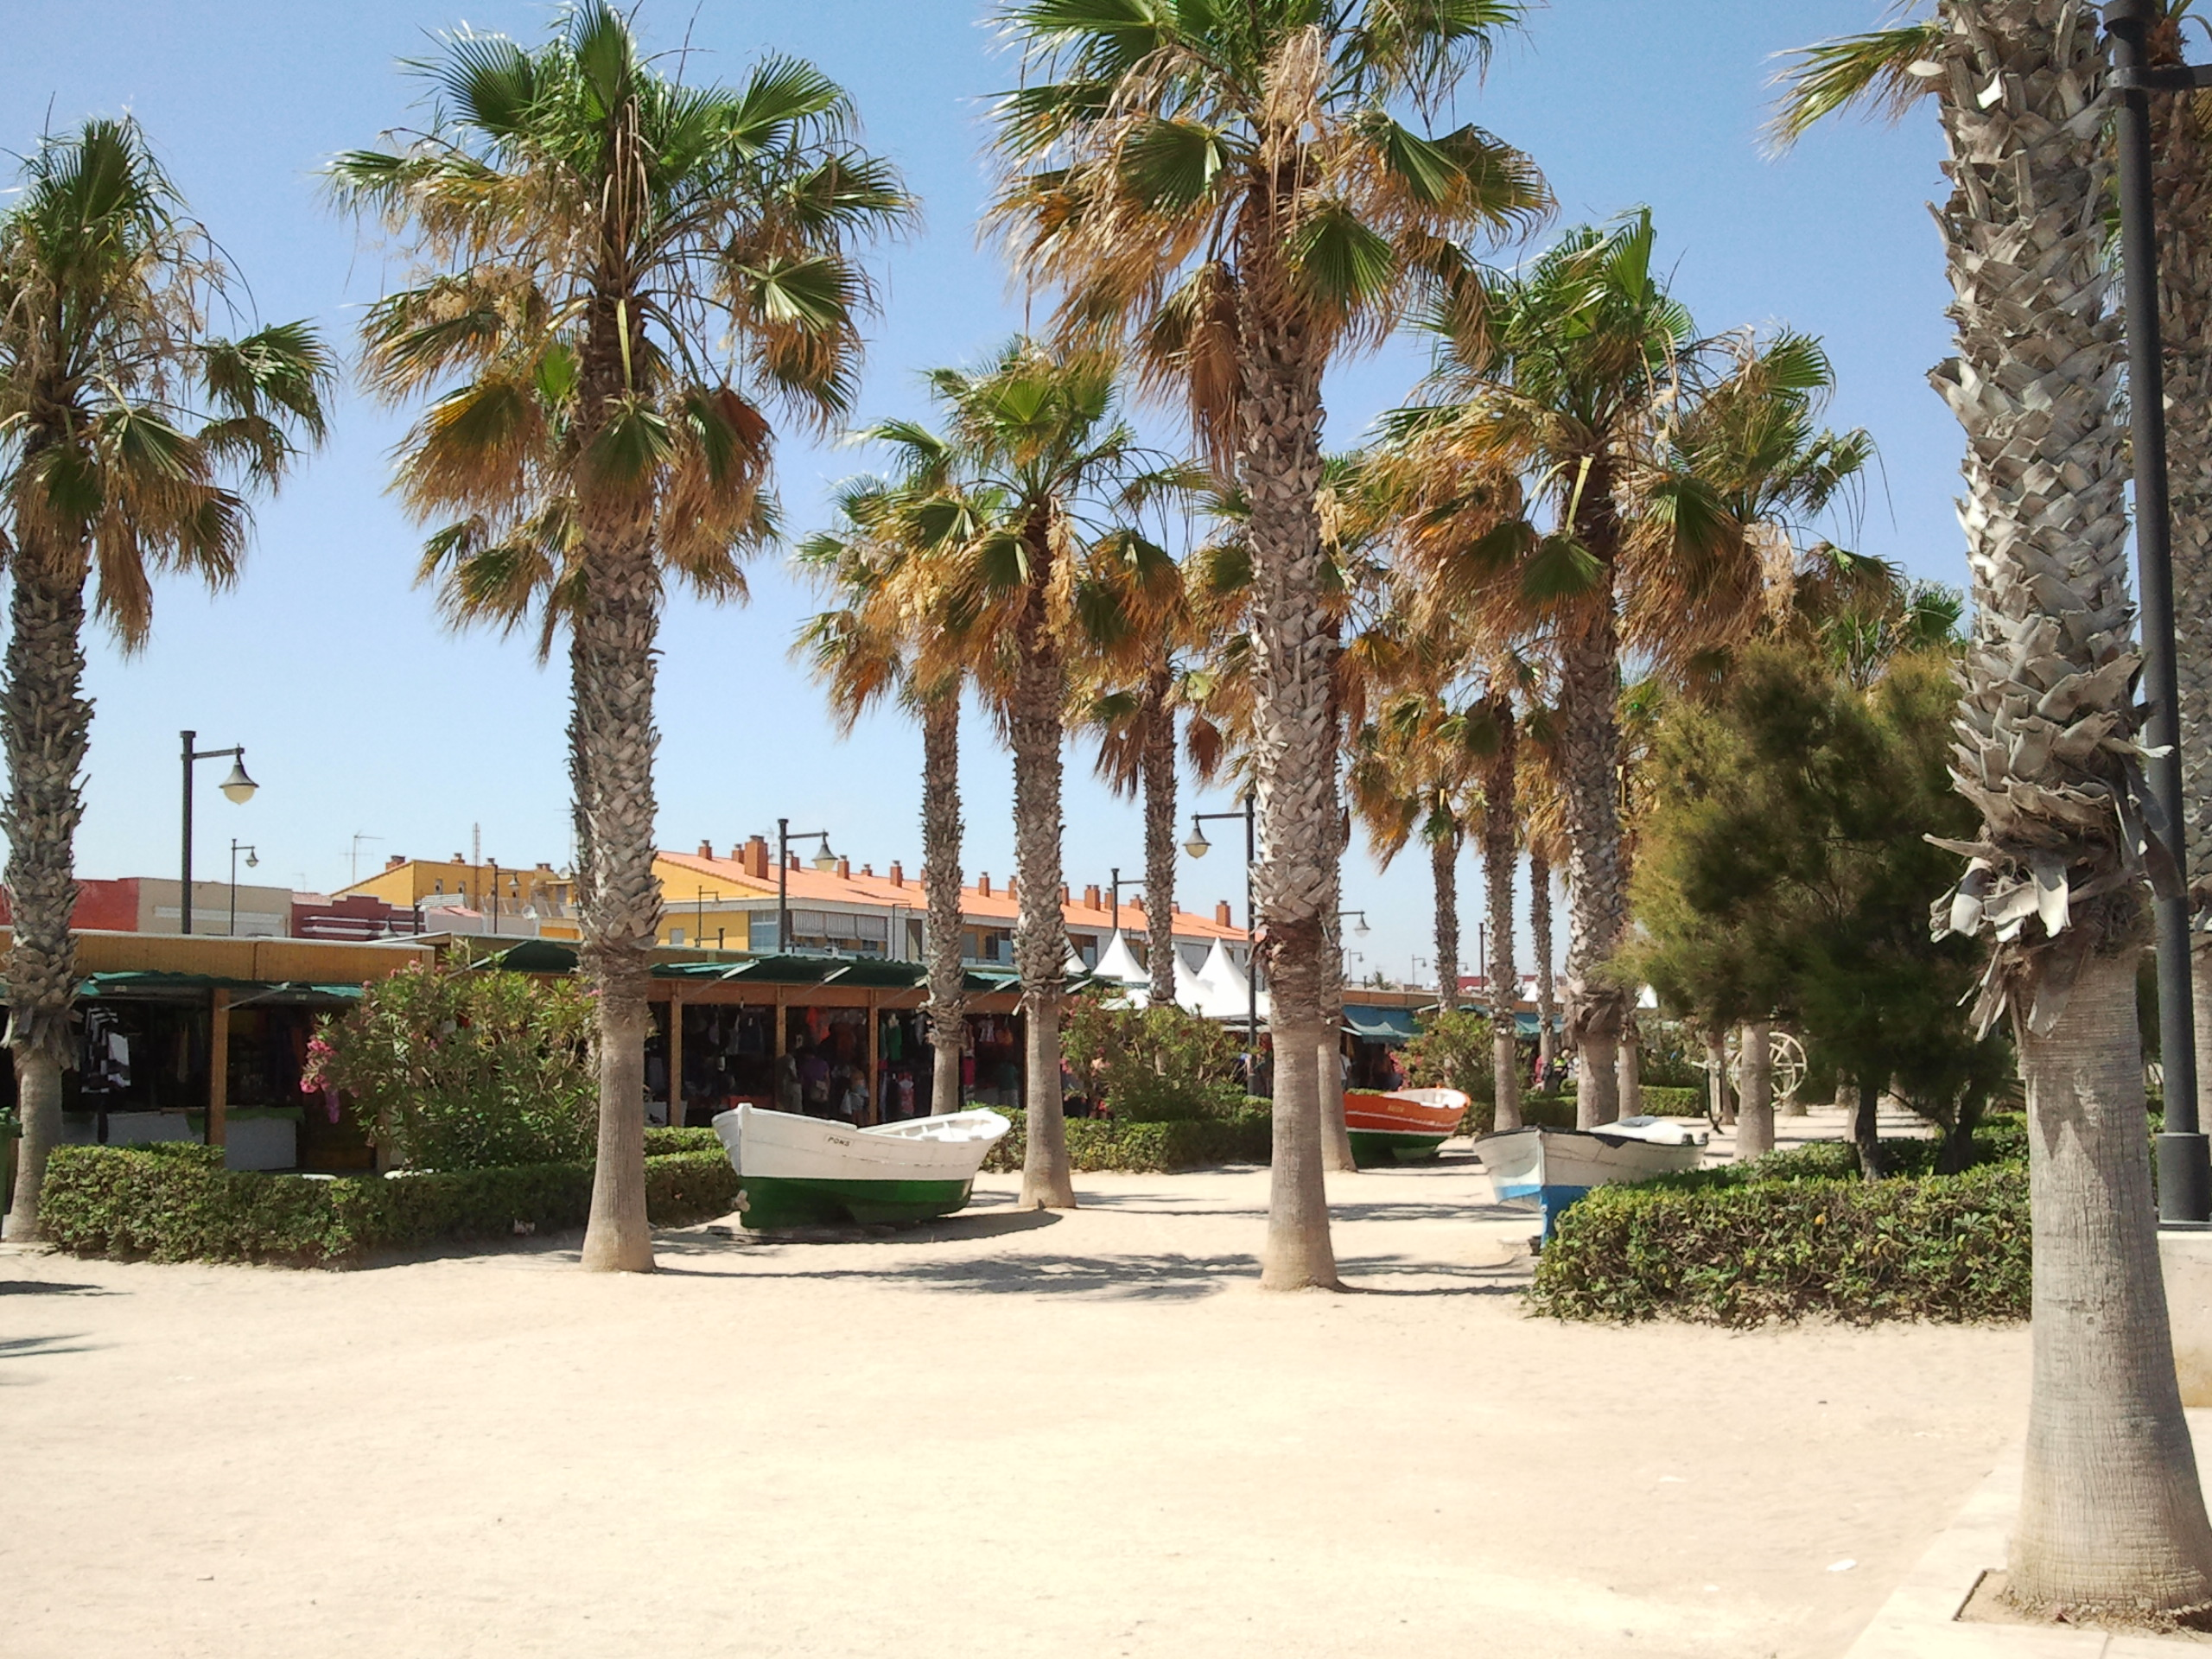 Property for Sale in Alicante